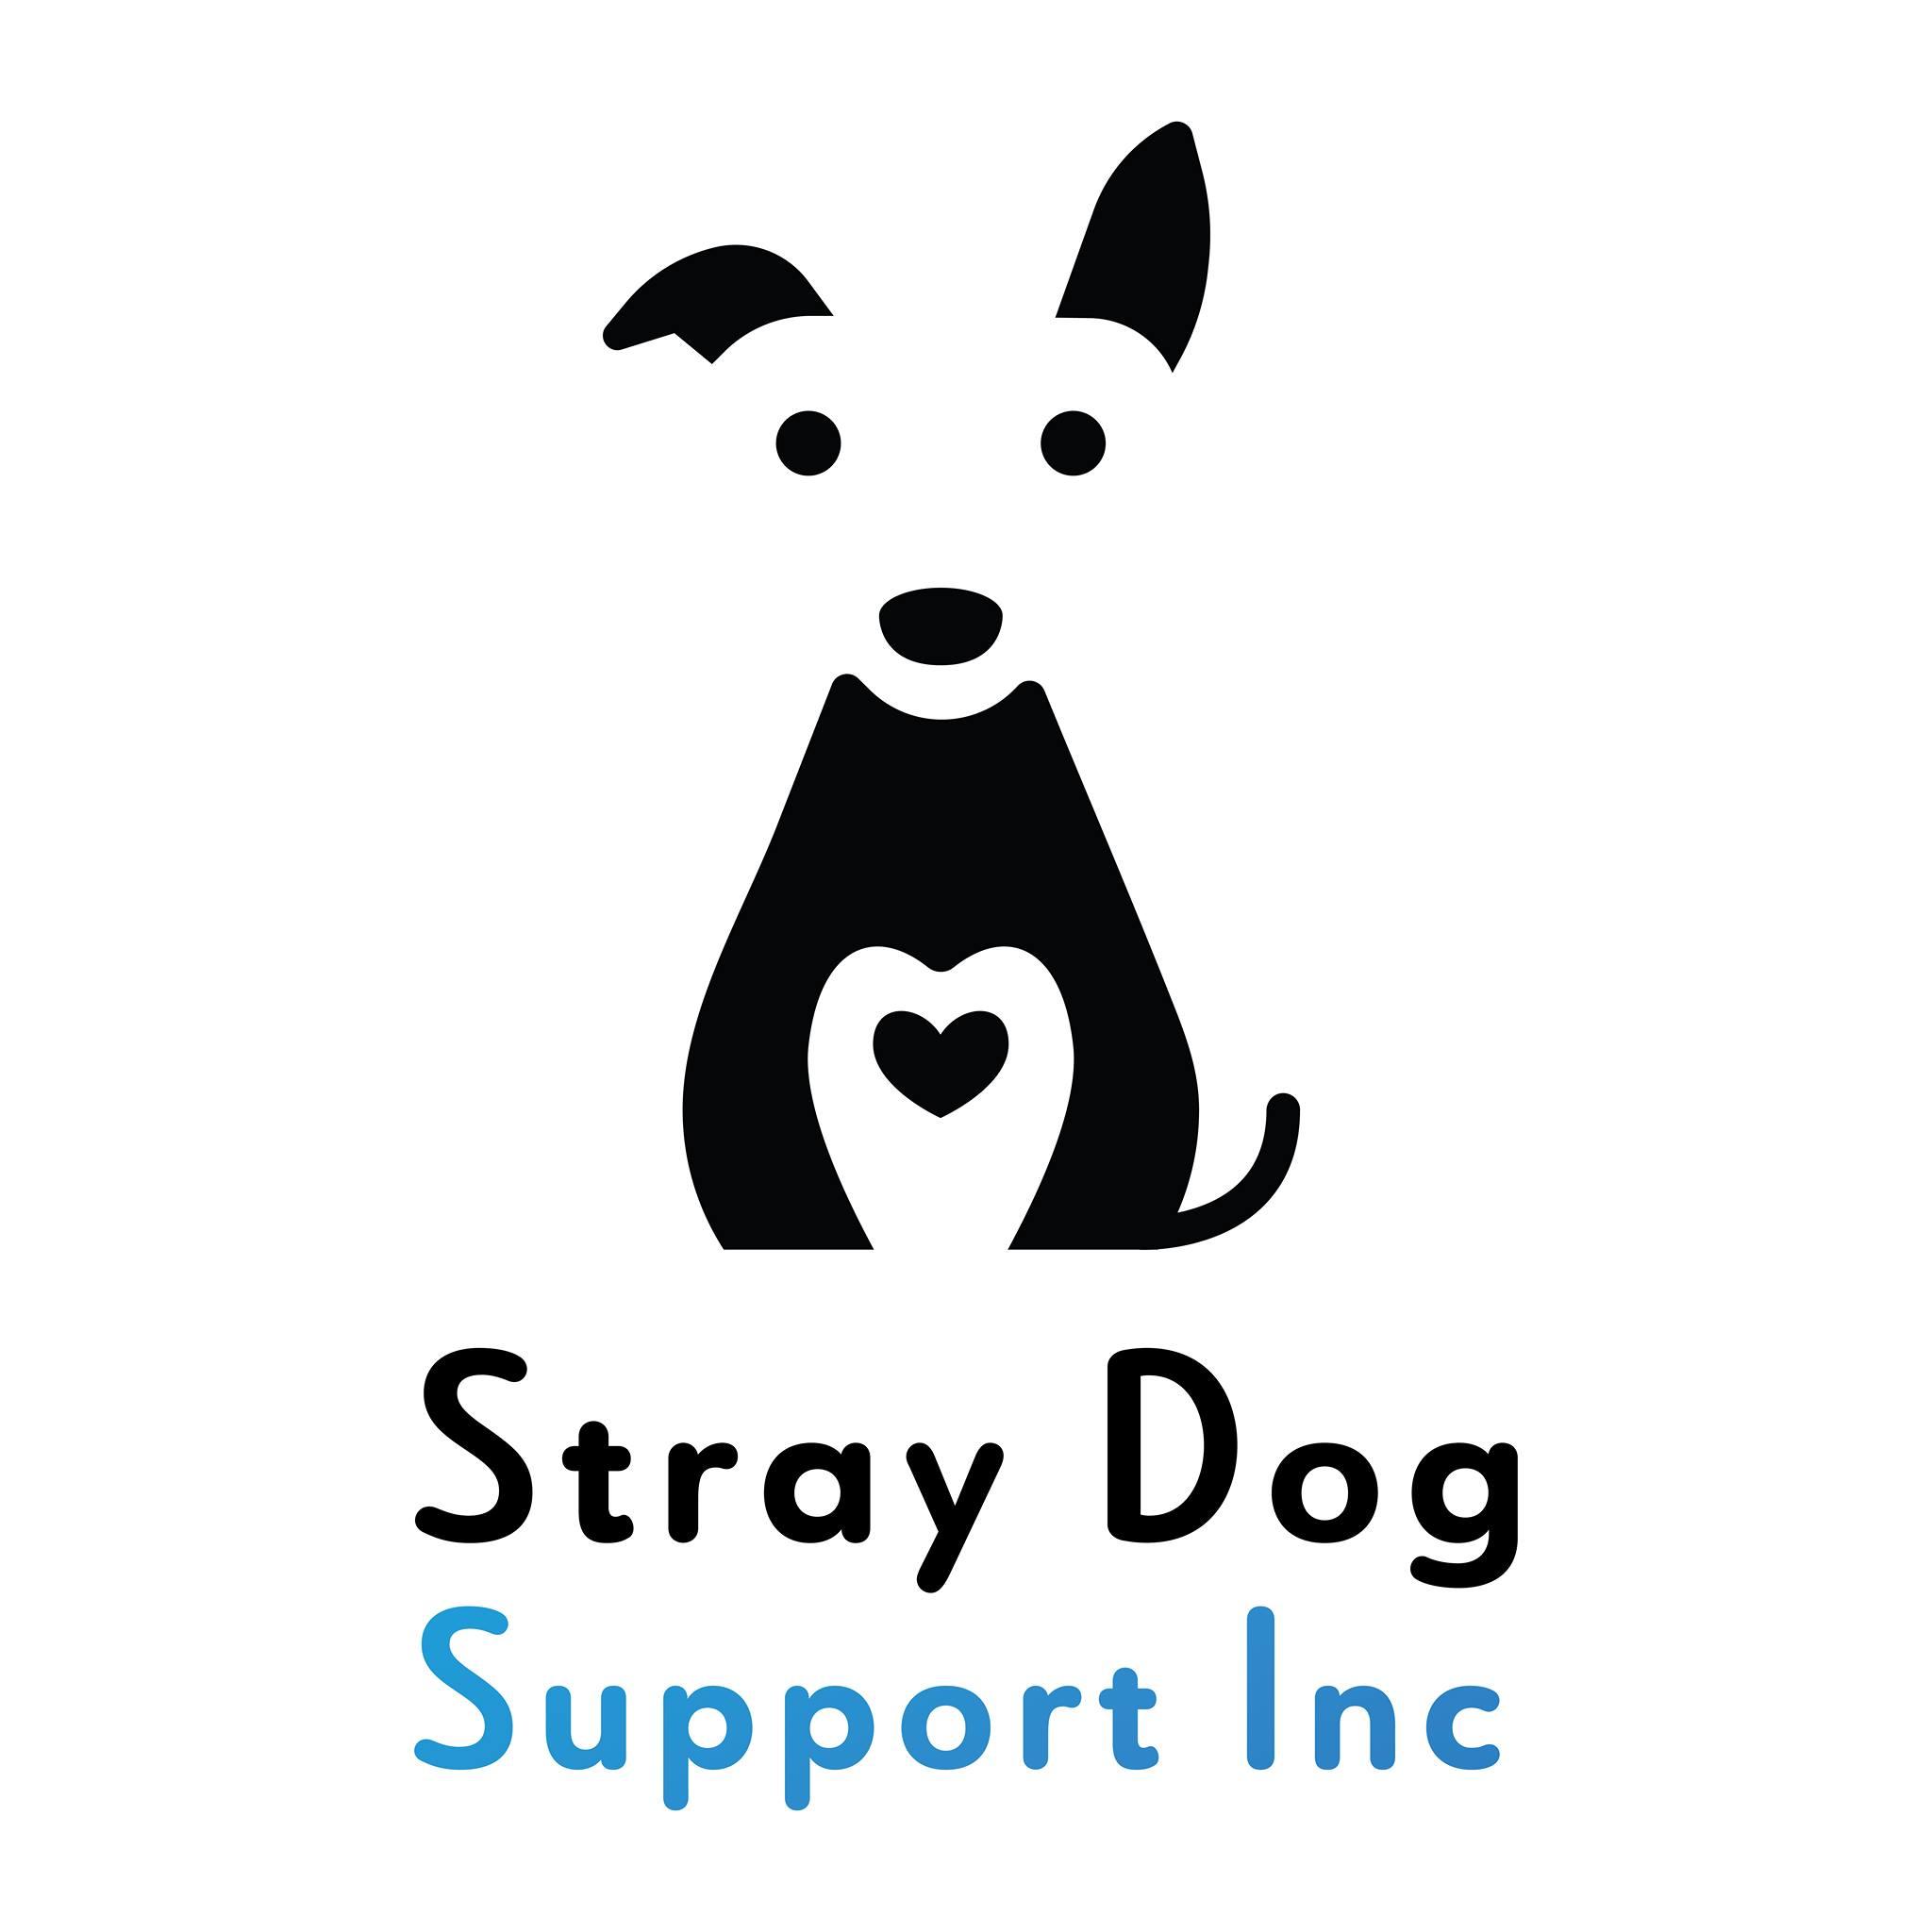 Stray Dog Support Inc